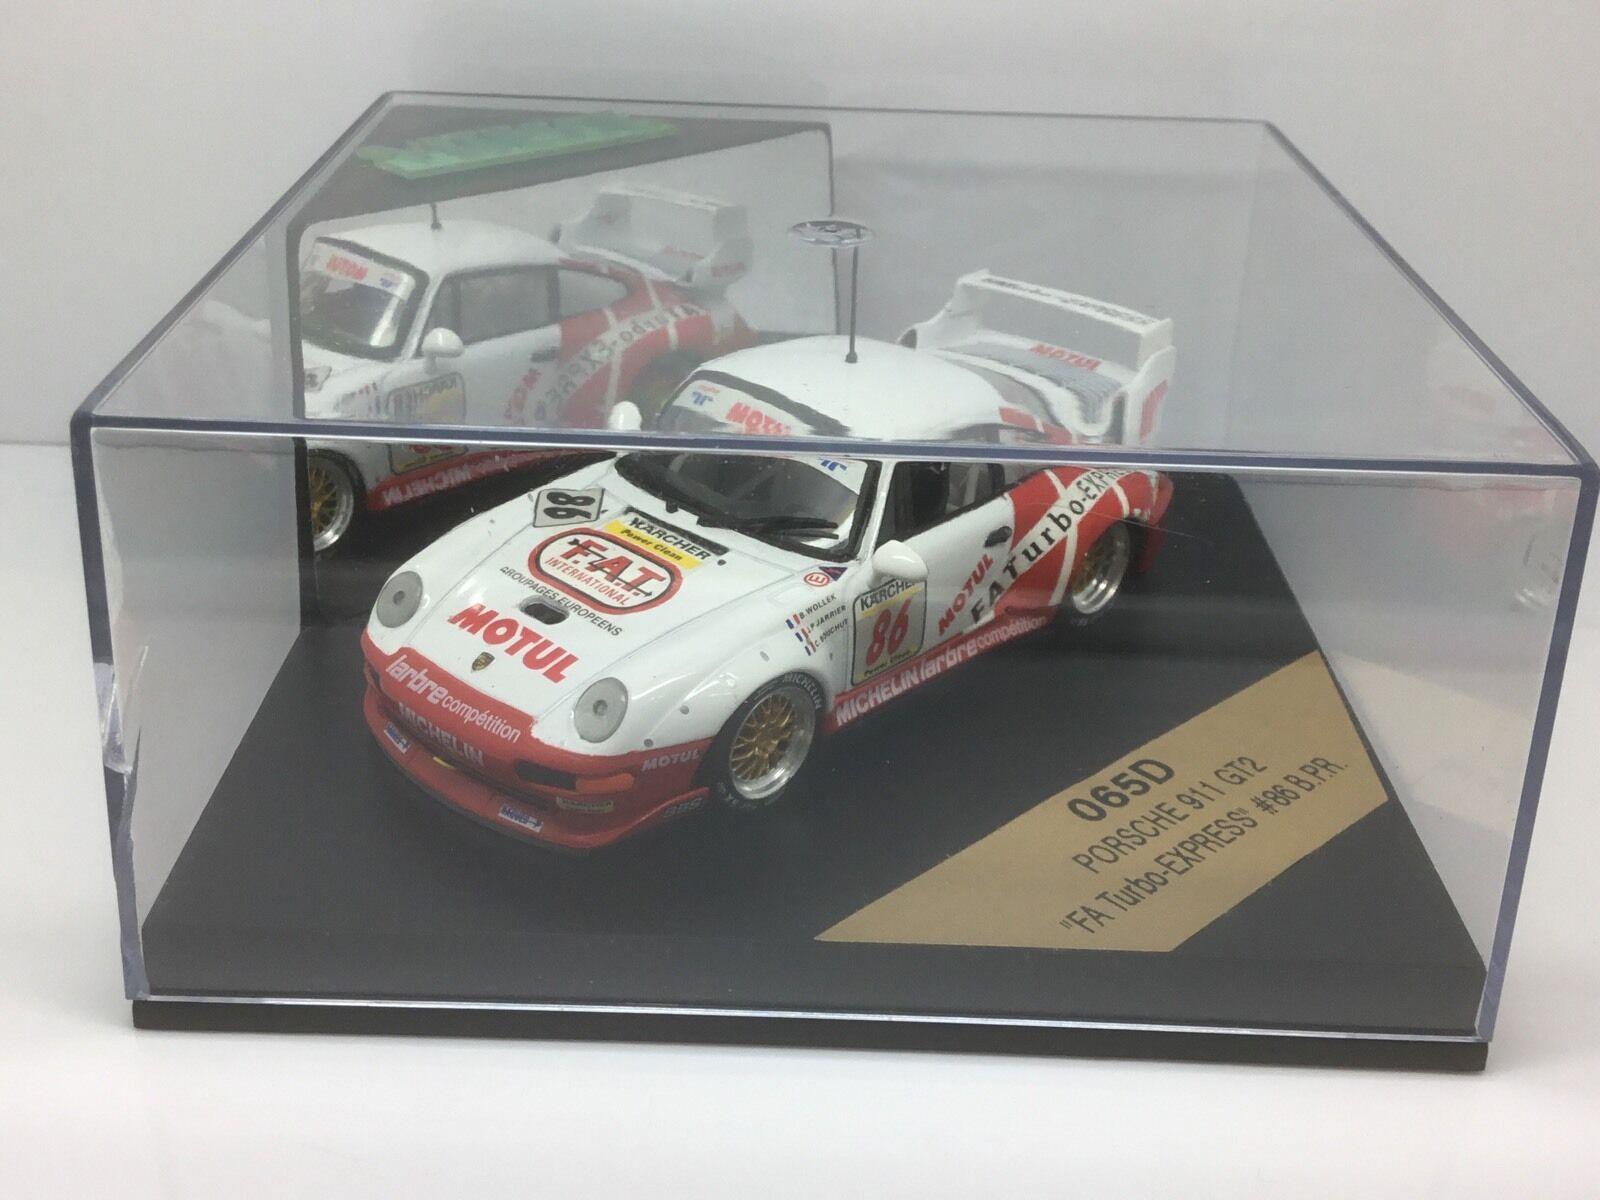 Vitesse Models 1 43 Scale Scale Scale 065D Porsche 911 GT2 FA TURBO EXPRESS 7c51c7